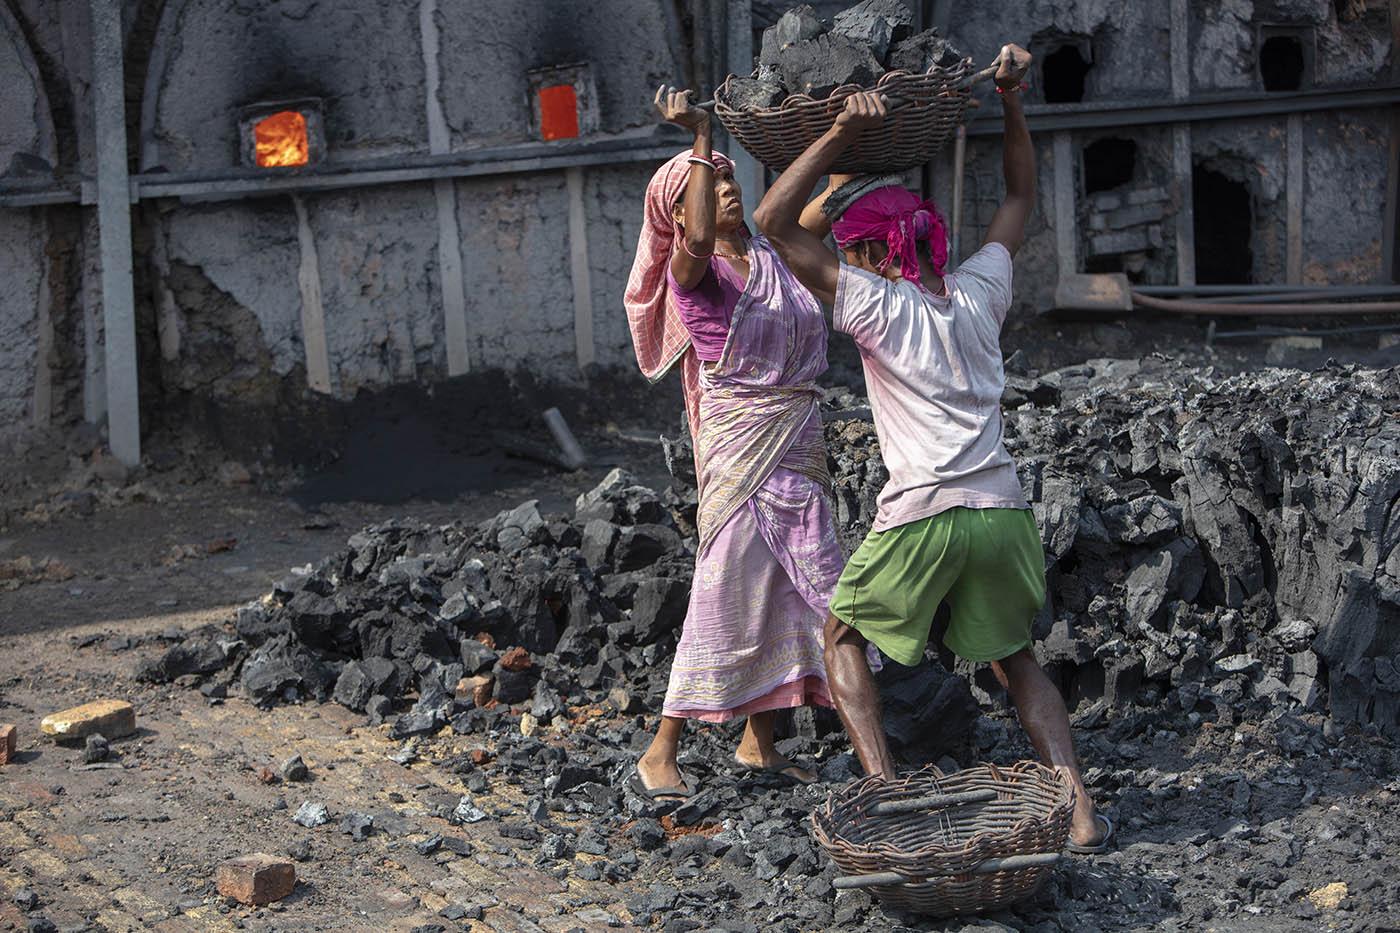 Ann_Johansson_The Face of Coal_03.JPG